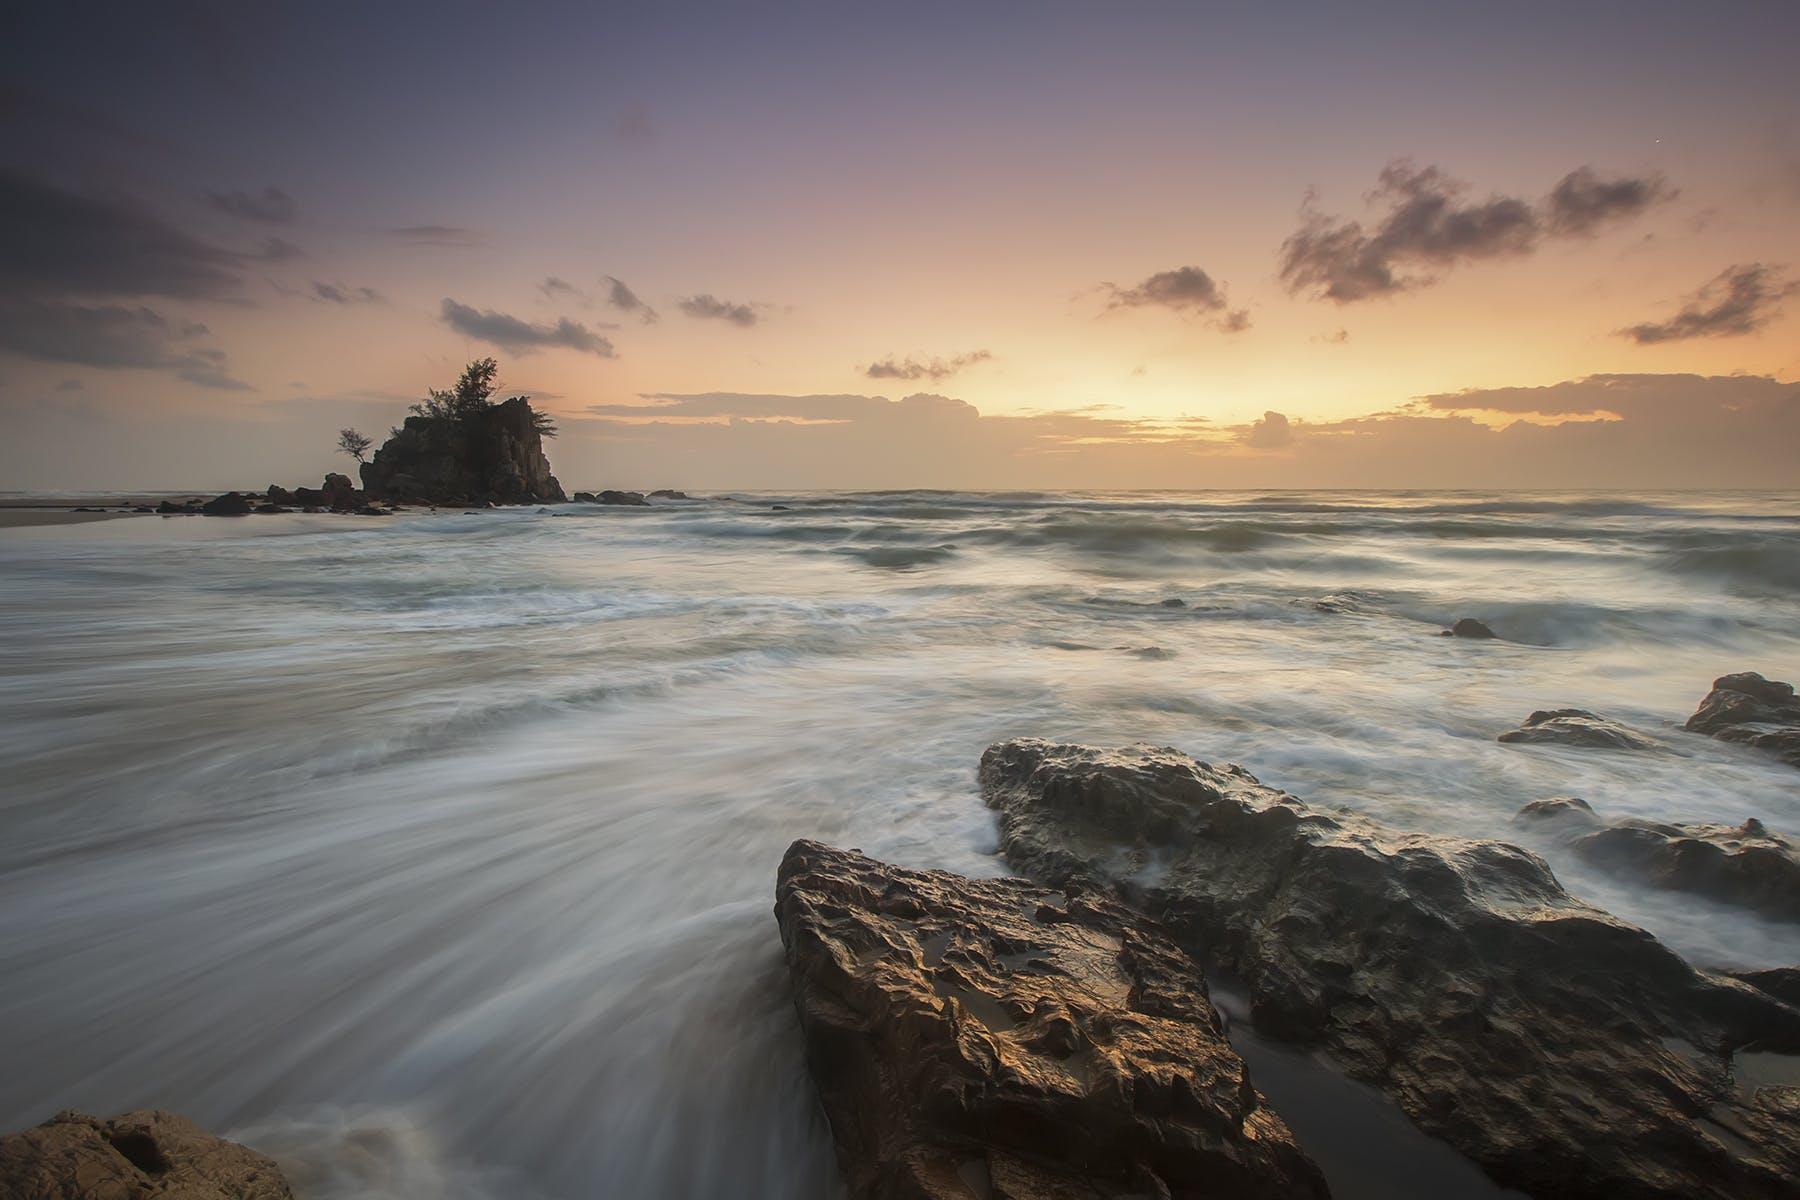 Rocks Near Body of Water Under Orange Sky during Daytime